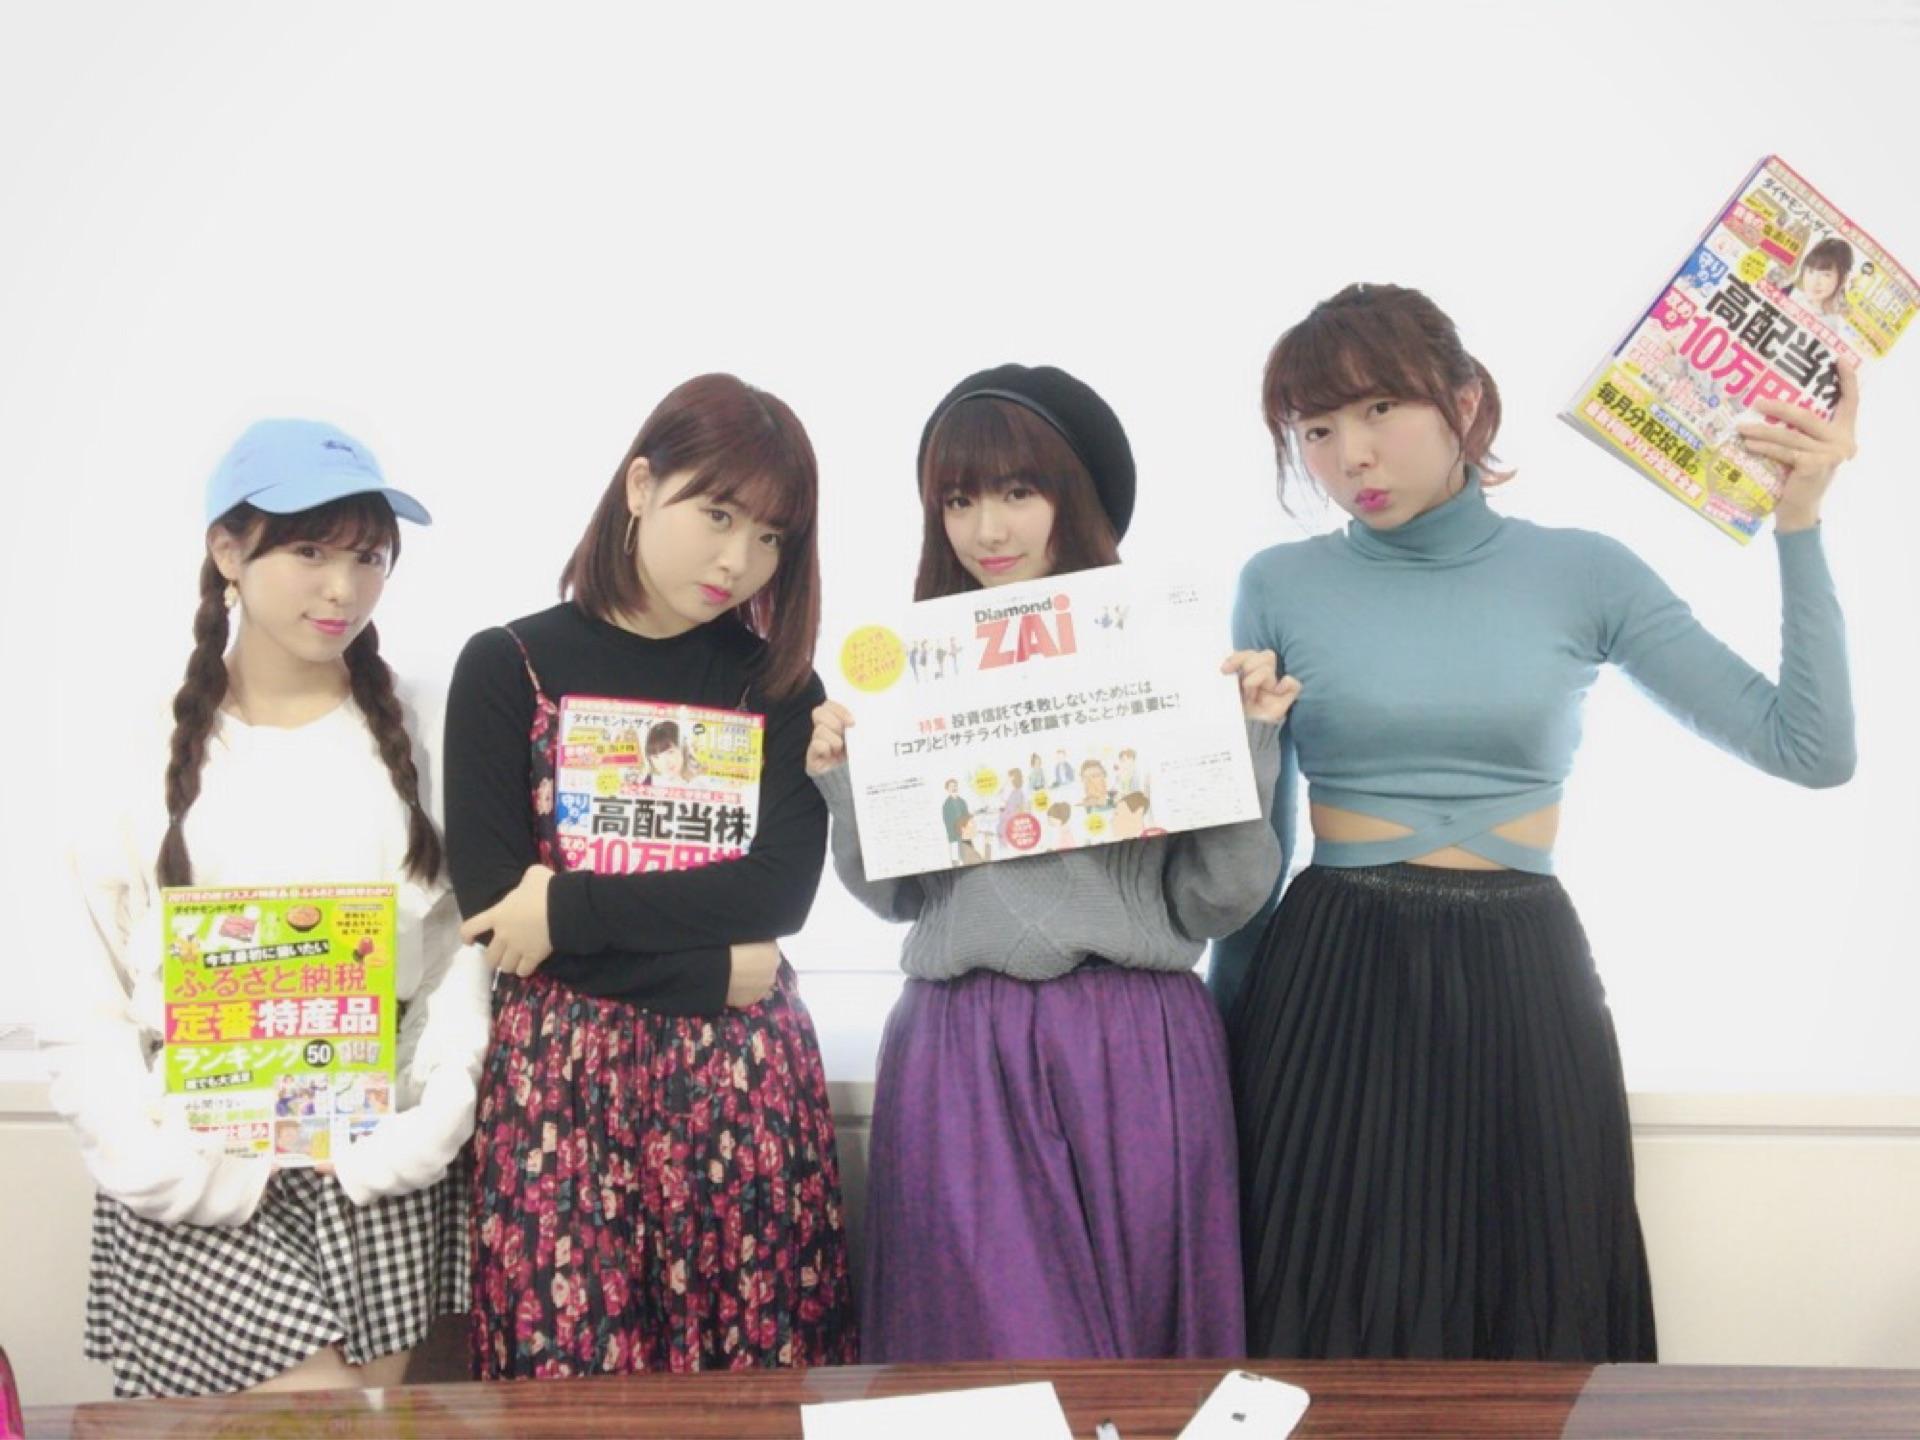 【AKB48卒業生】森川彩香応援スレ☆46【あーやロイド】©2ch.netYouTube動画>4本 ->画像>302枚